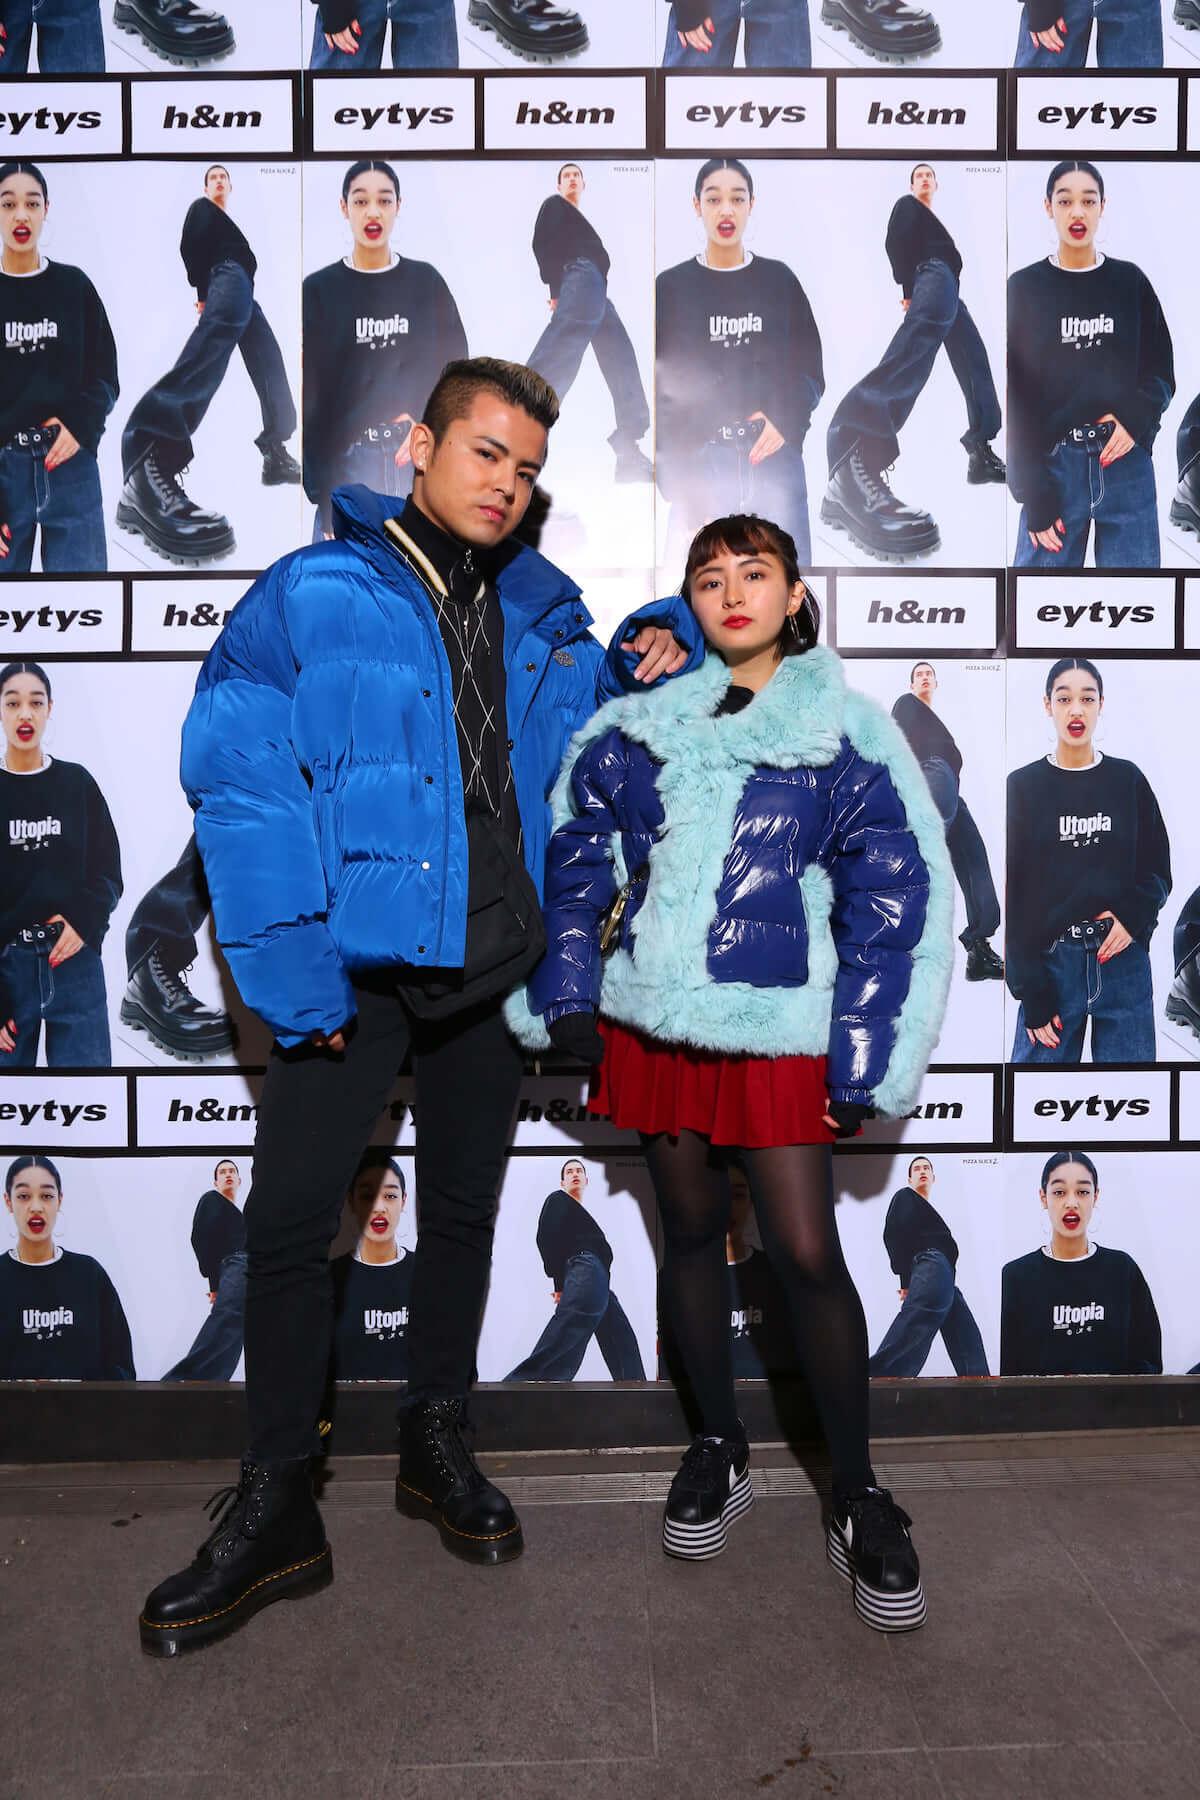 Eytys×H&Mのコラボコレクションが本日より発売開始 life-fashion190124-hm-eytys-5-1200x1800